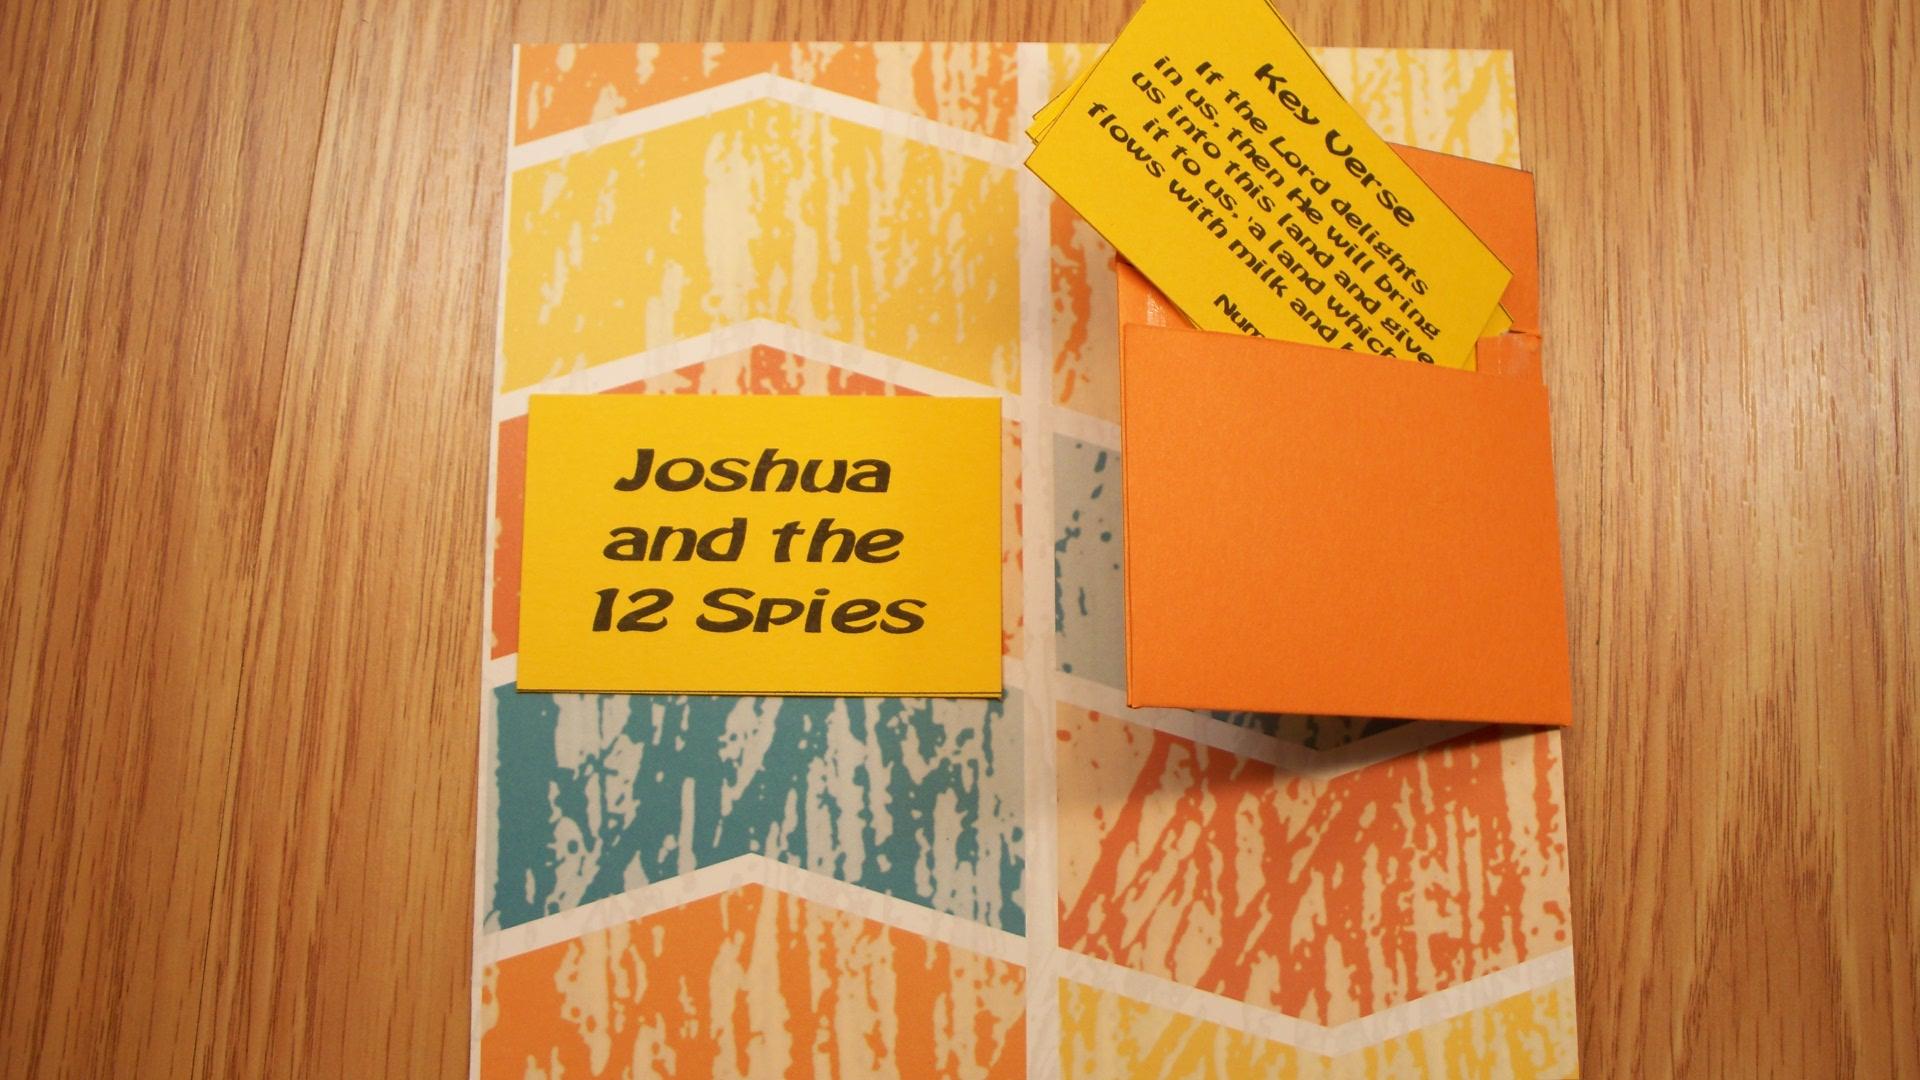 Joshua Bible Story / Joshua And The 12 Spies